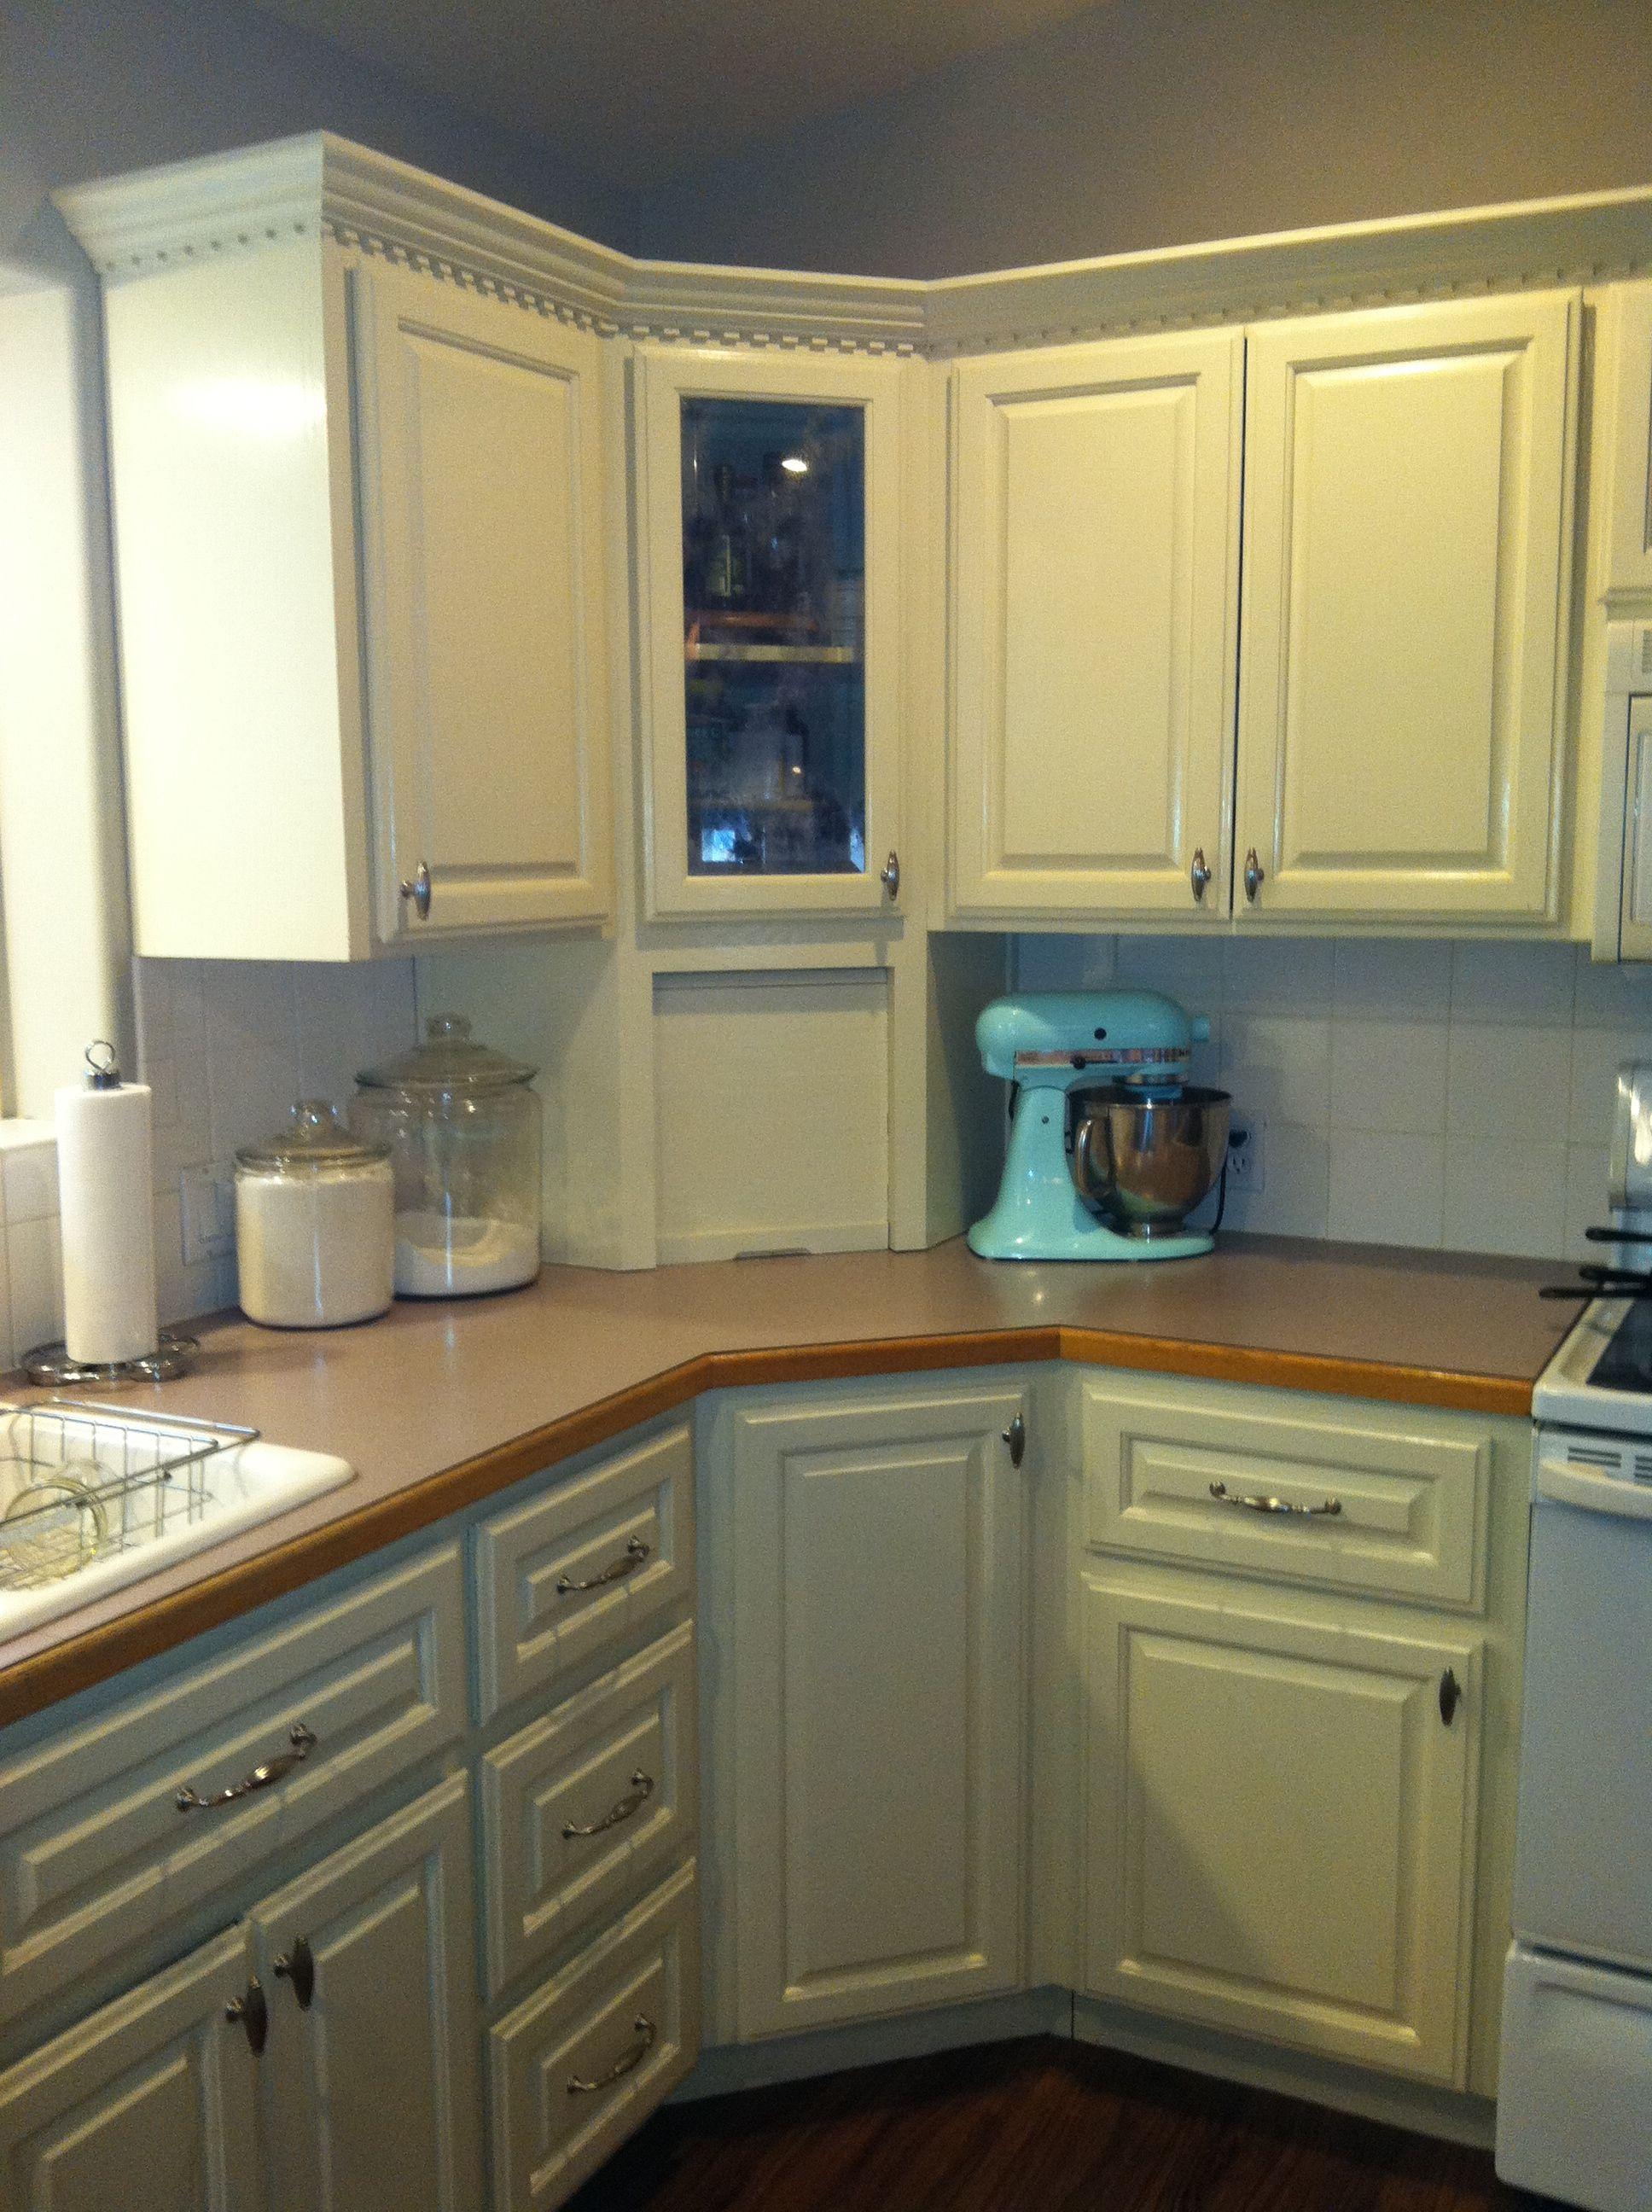 appliance garage kitchen appliance garage kitchen cabinets decor kitchen on kitchen appliances id=93116